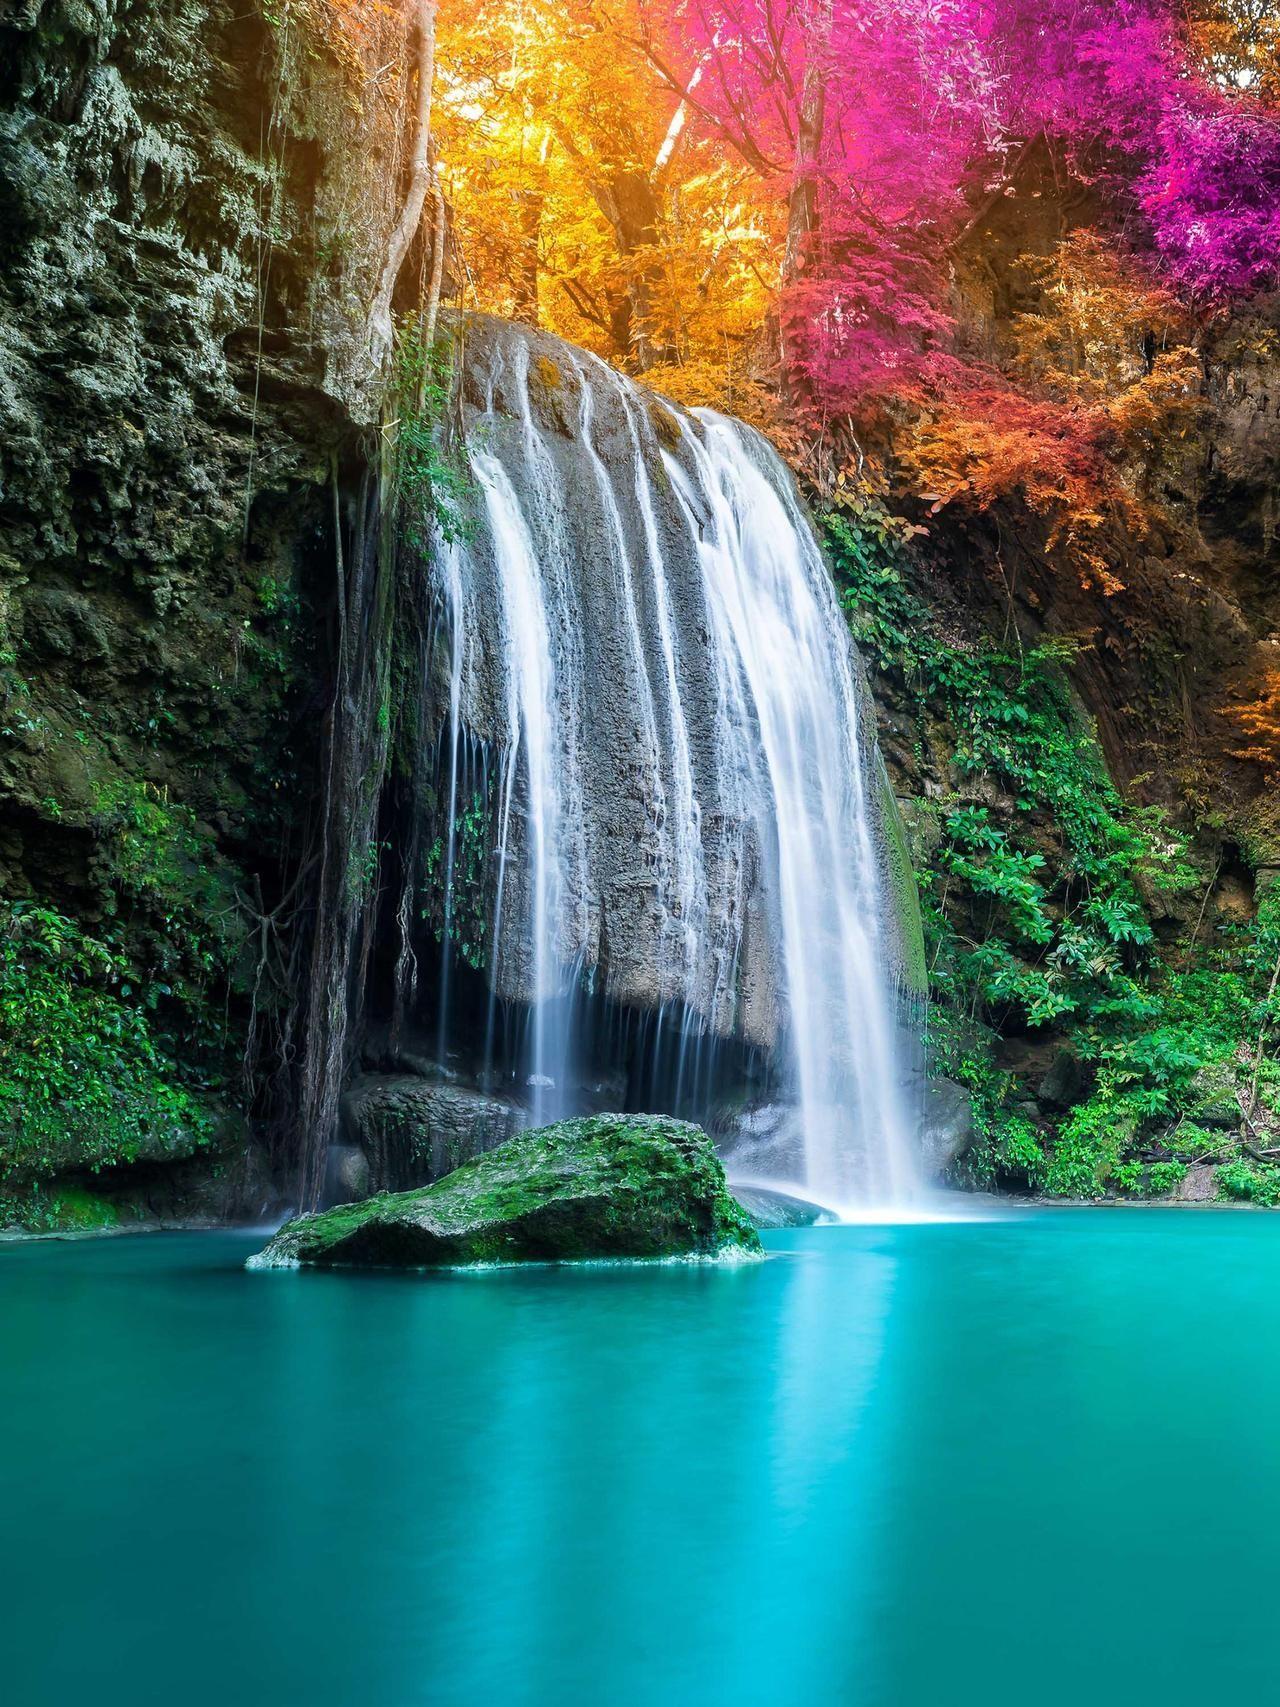 Incredible Waterfall At Ubud Indonesia Nature Photography Beautiful Nature Beautiful Landscapes Nature Photography